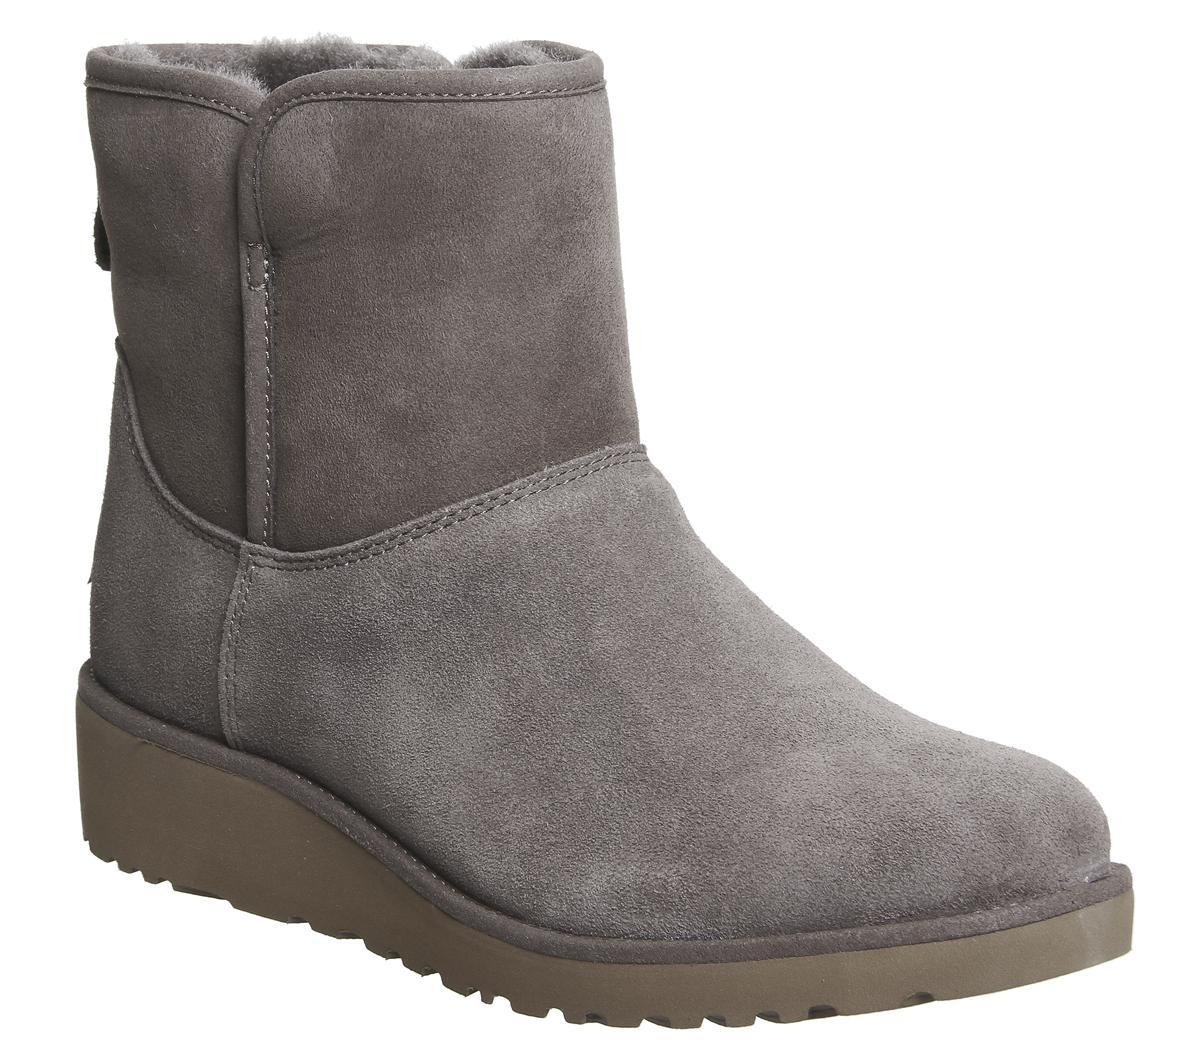 34a7175c28ad Lyst - UGG Classic Slim Kristin Mini Boots in Gray